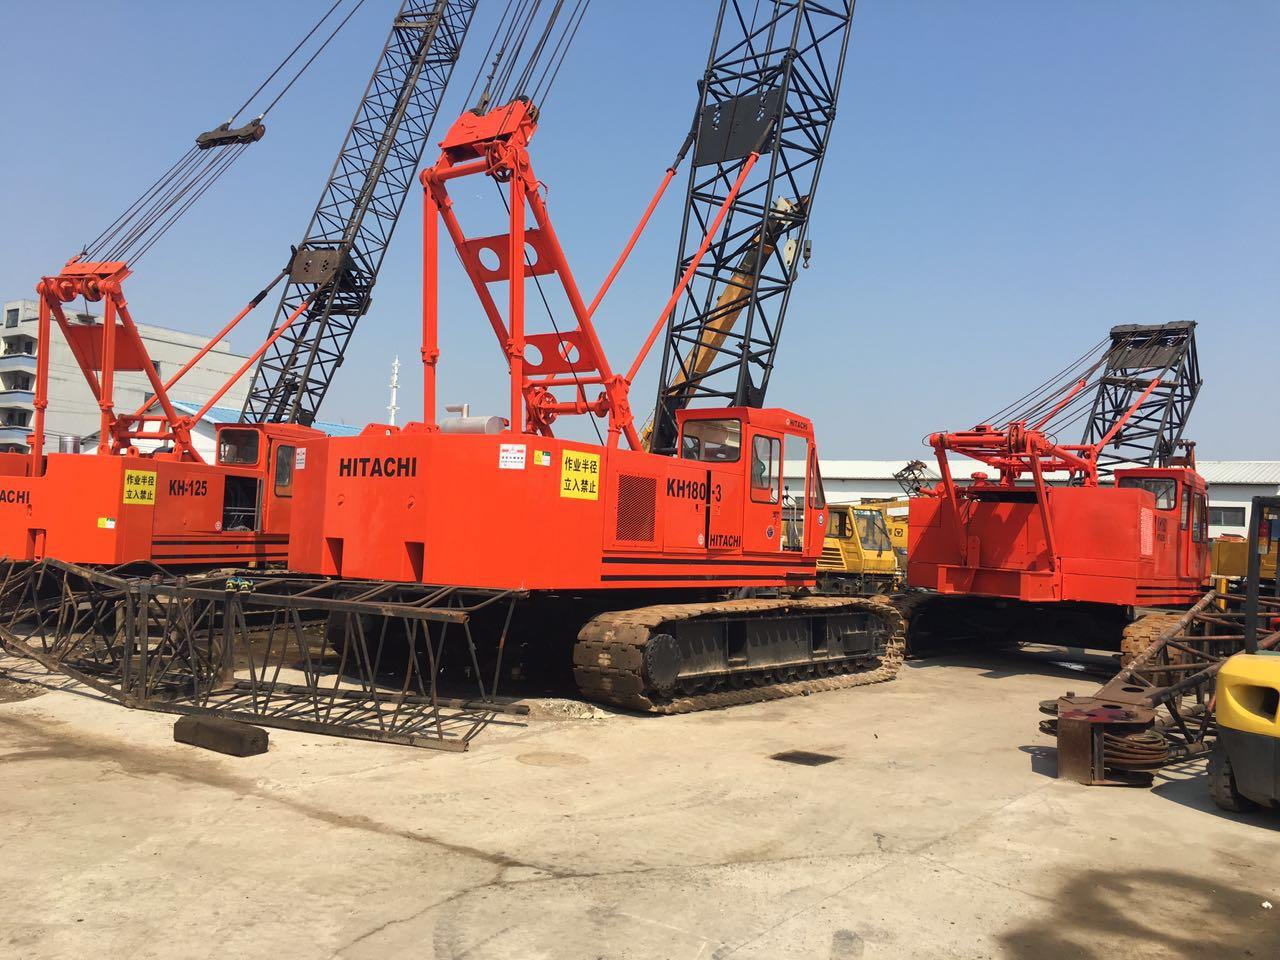 Hitachi KH180 crawler crane, 50 55 ton Japan original crawler crane hot in sale